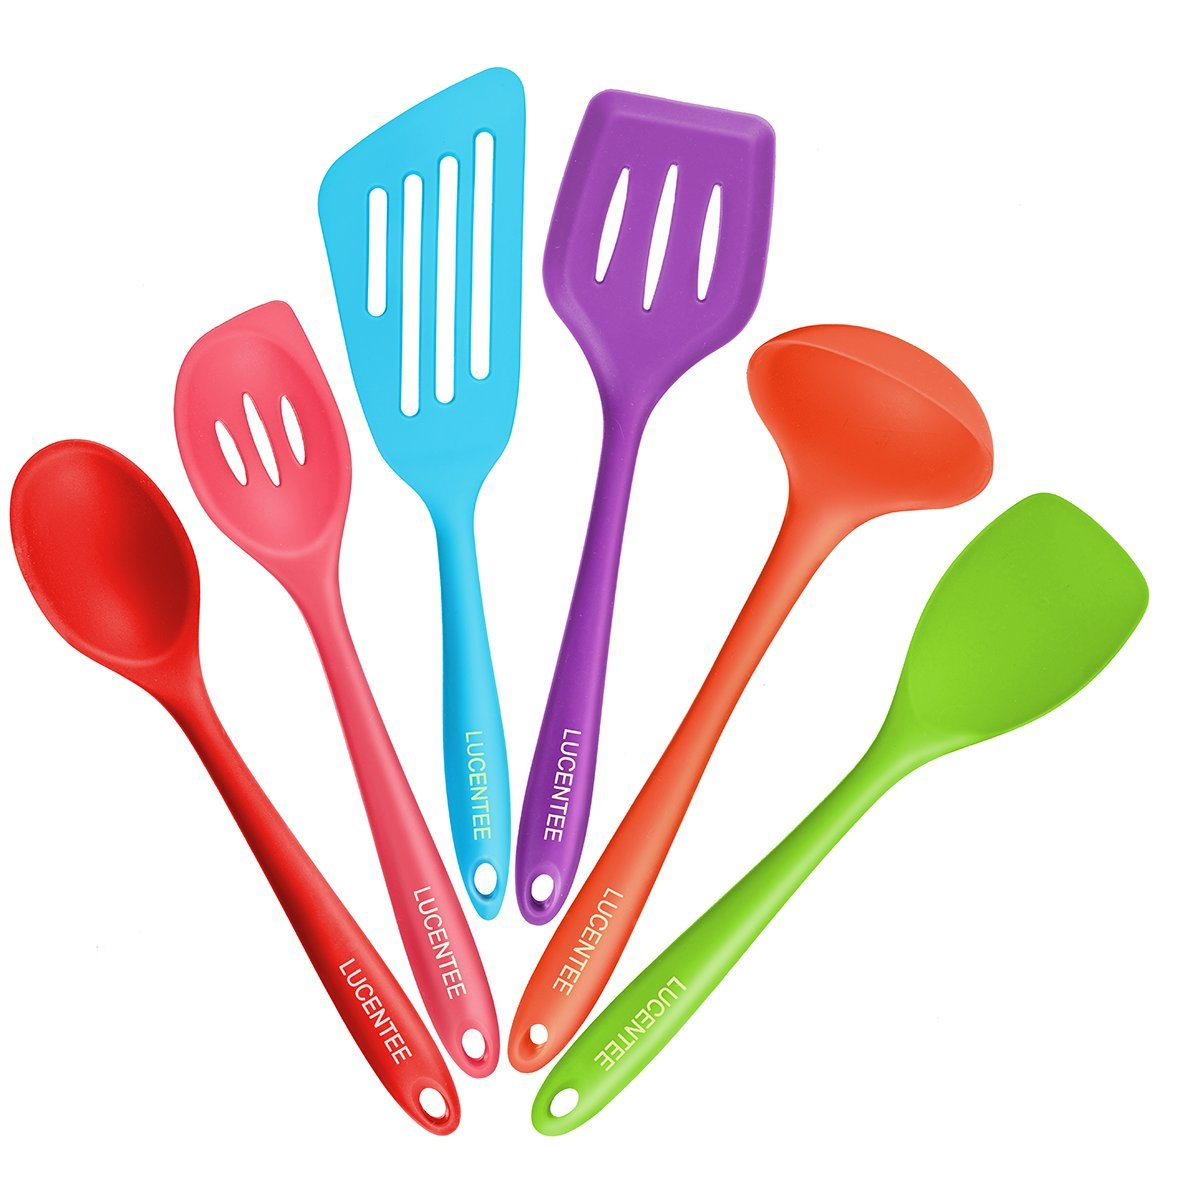 6 Piece Utensils Cooking Kitchen Silicone Set Tool Kit Spatula Spoon Kitchen